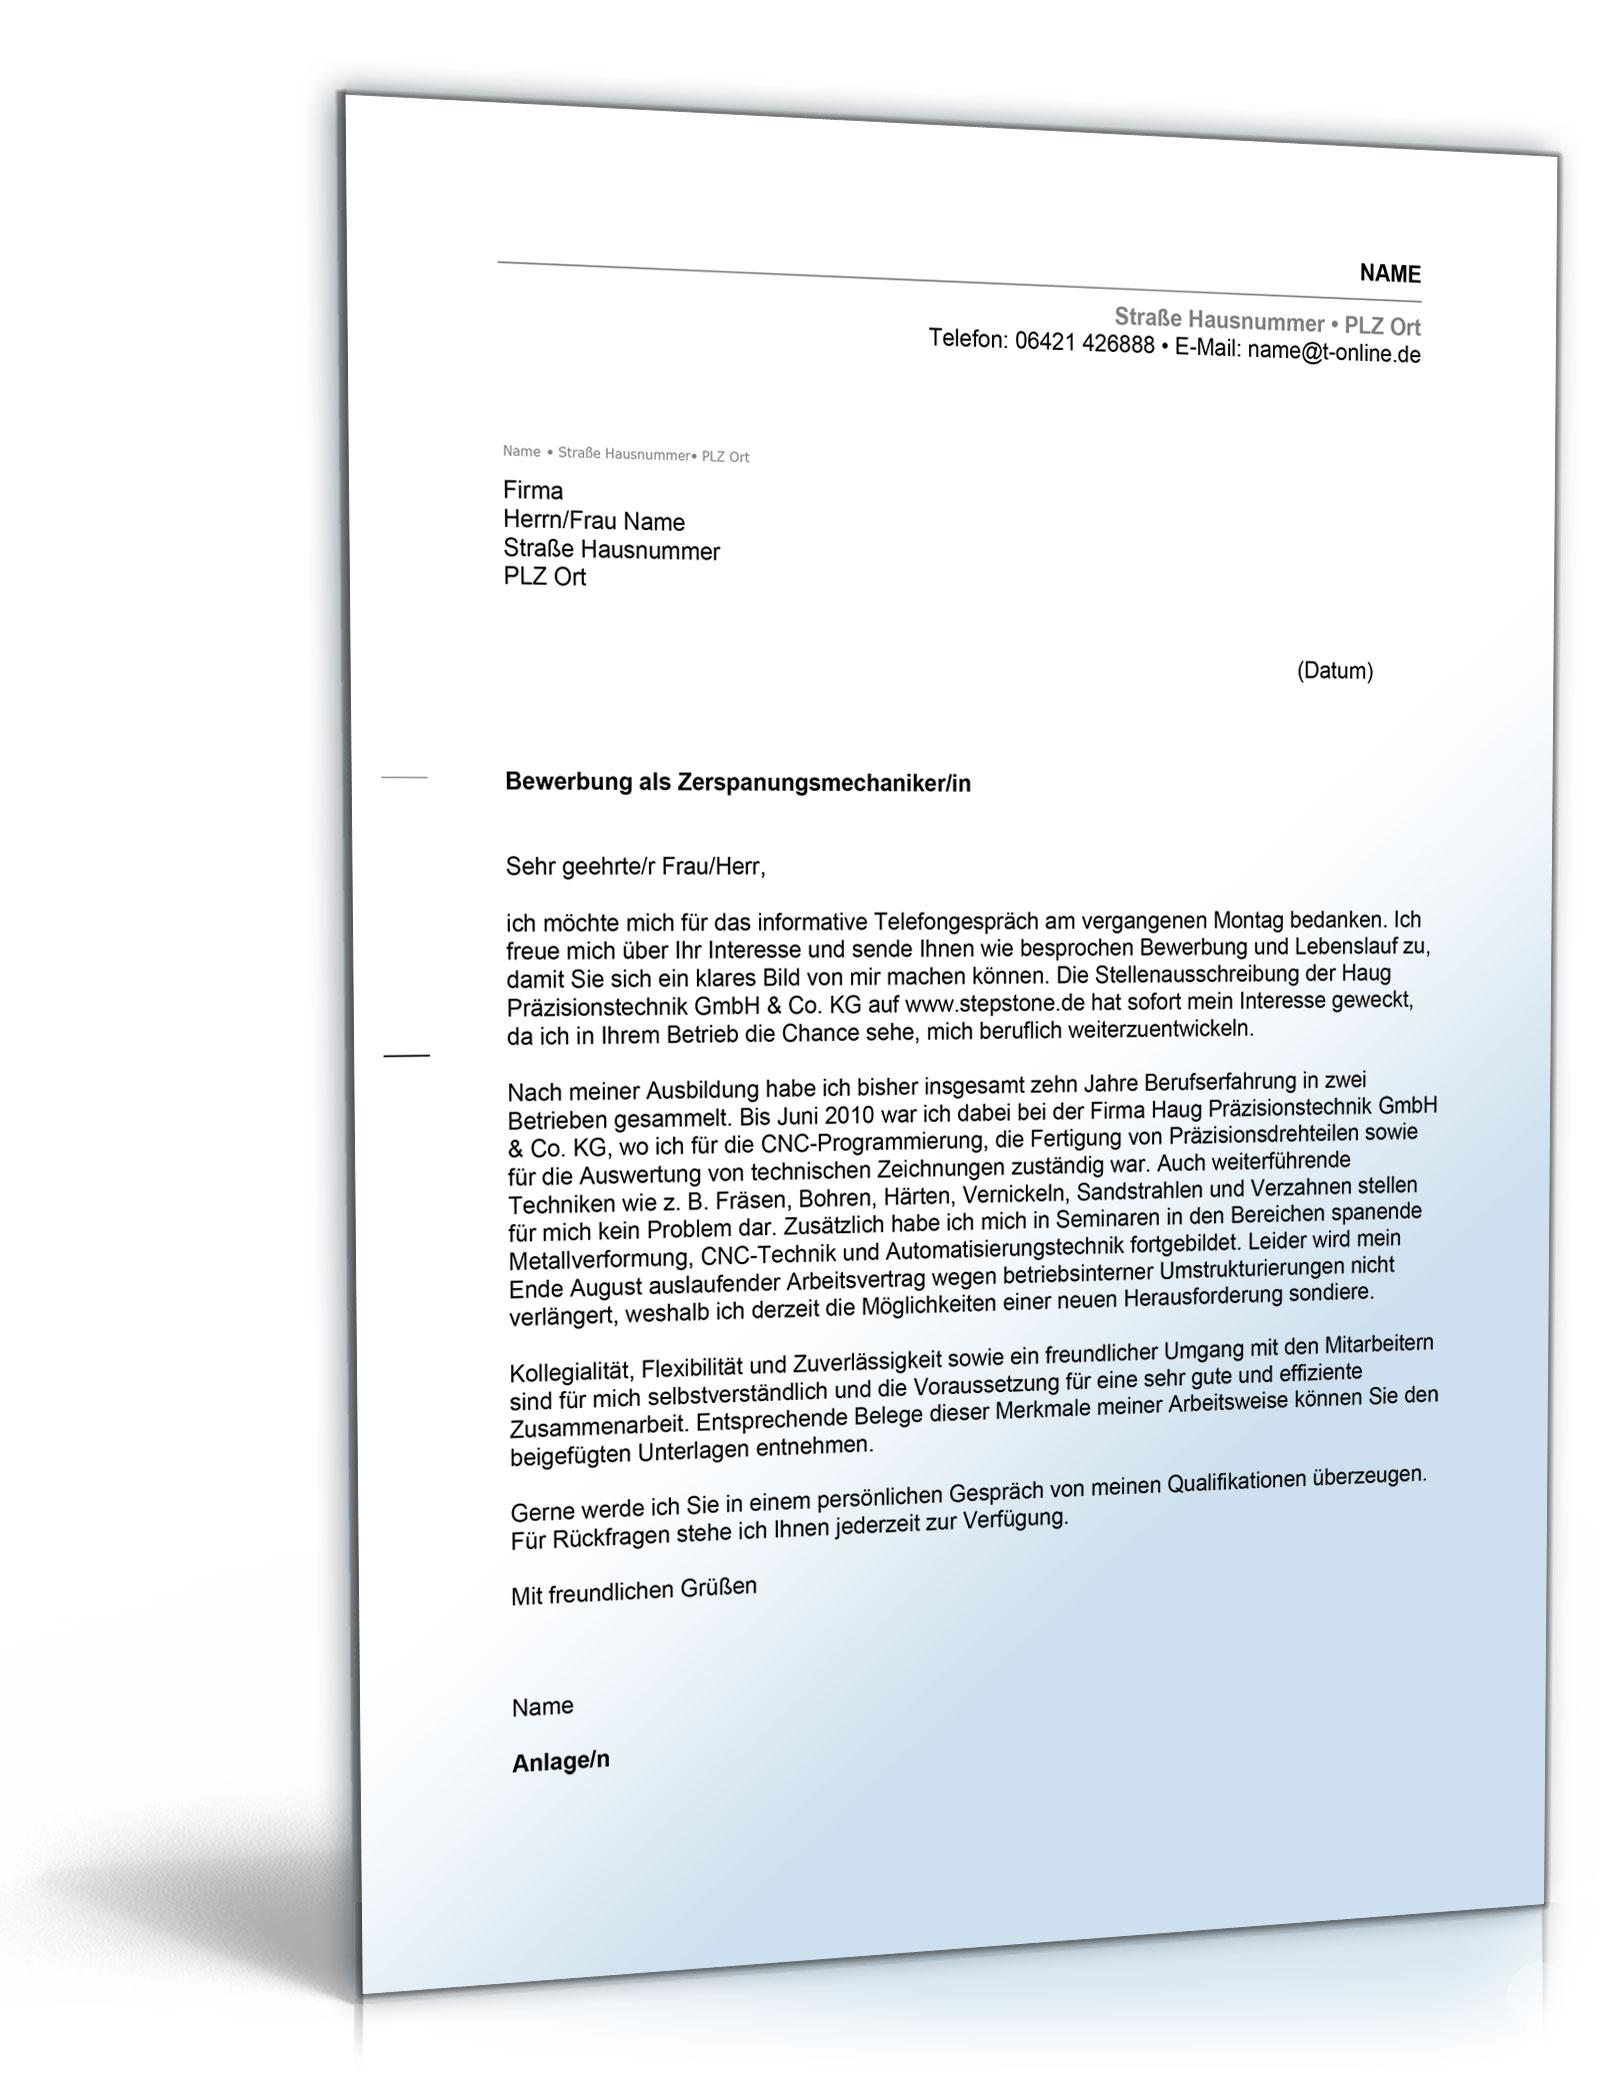 Bewerbung Als Zerspanungsmechaniker | marlpoint